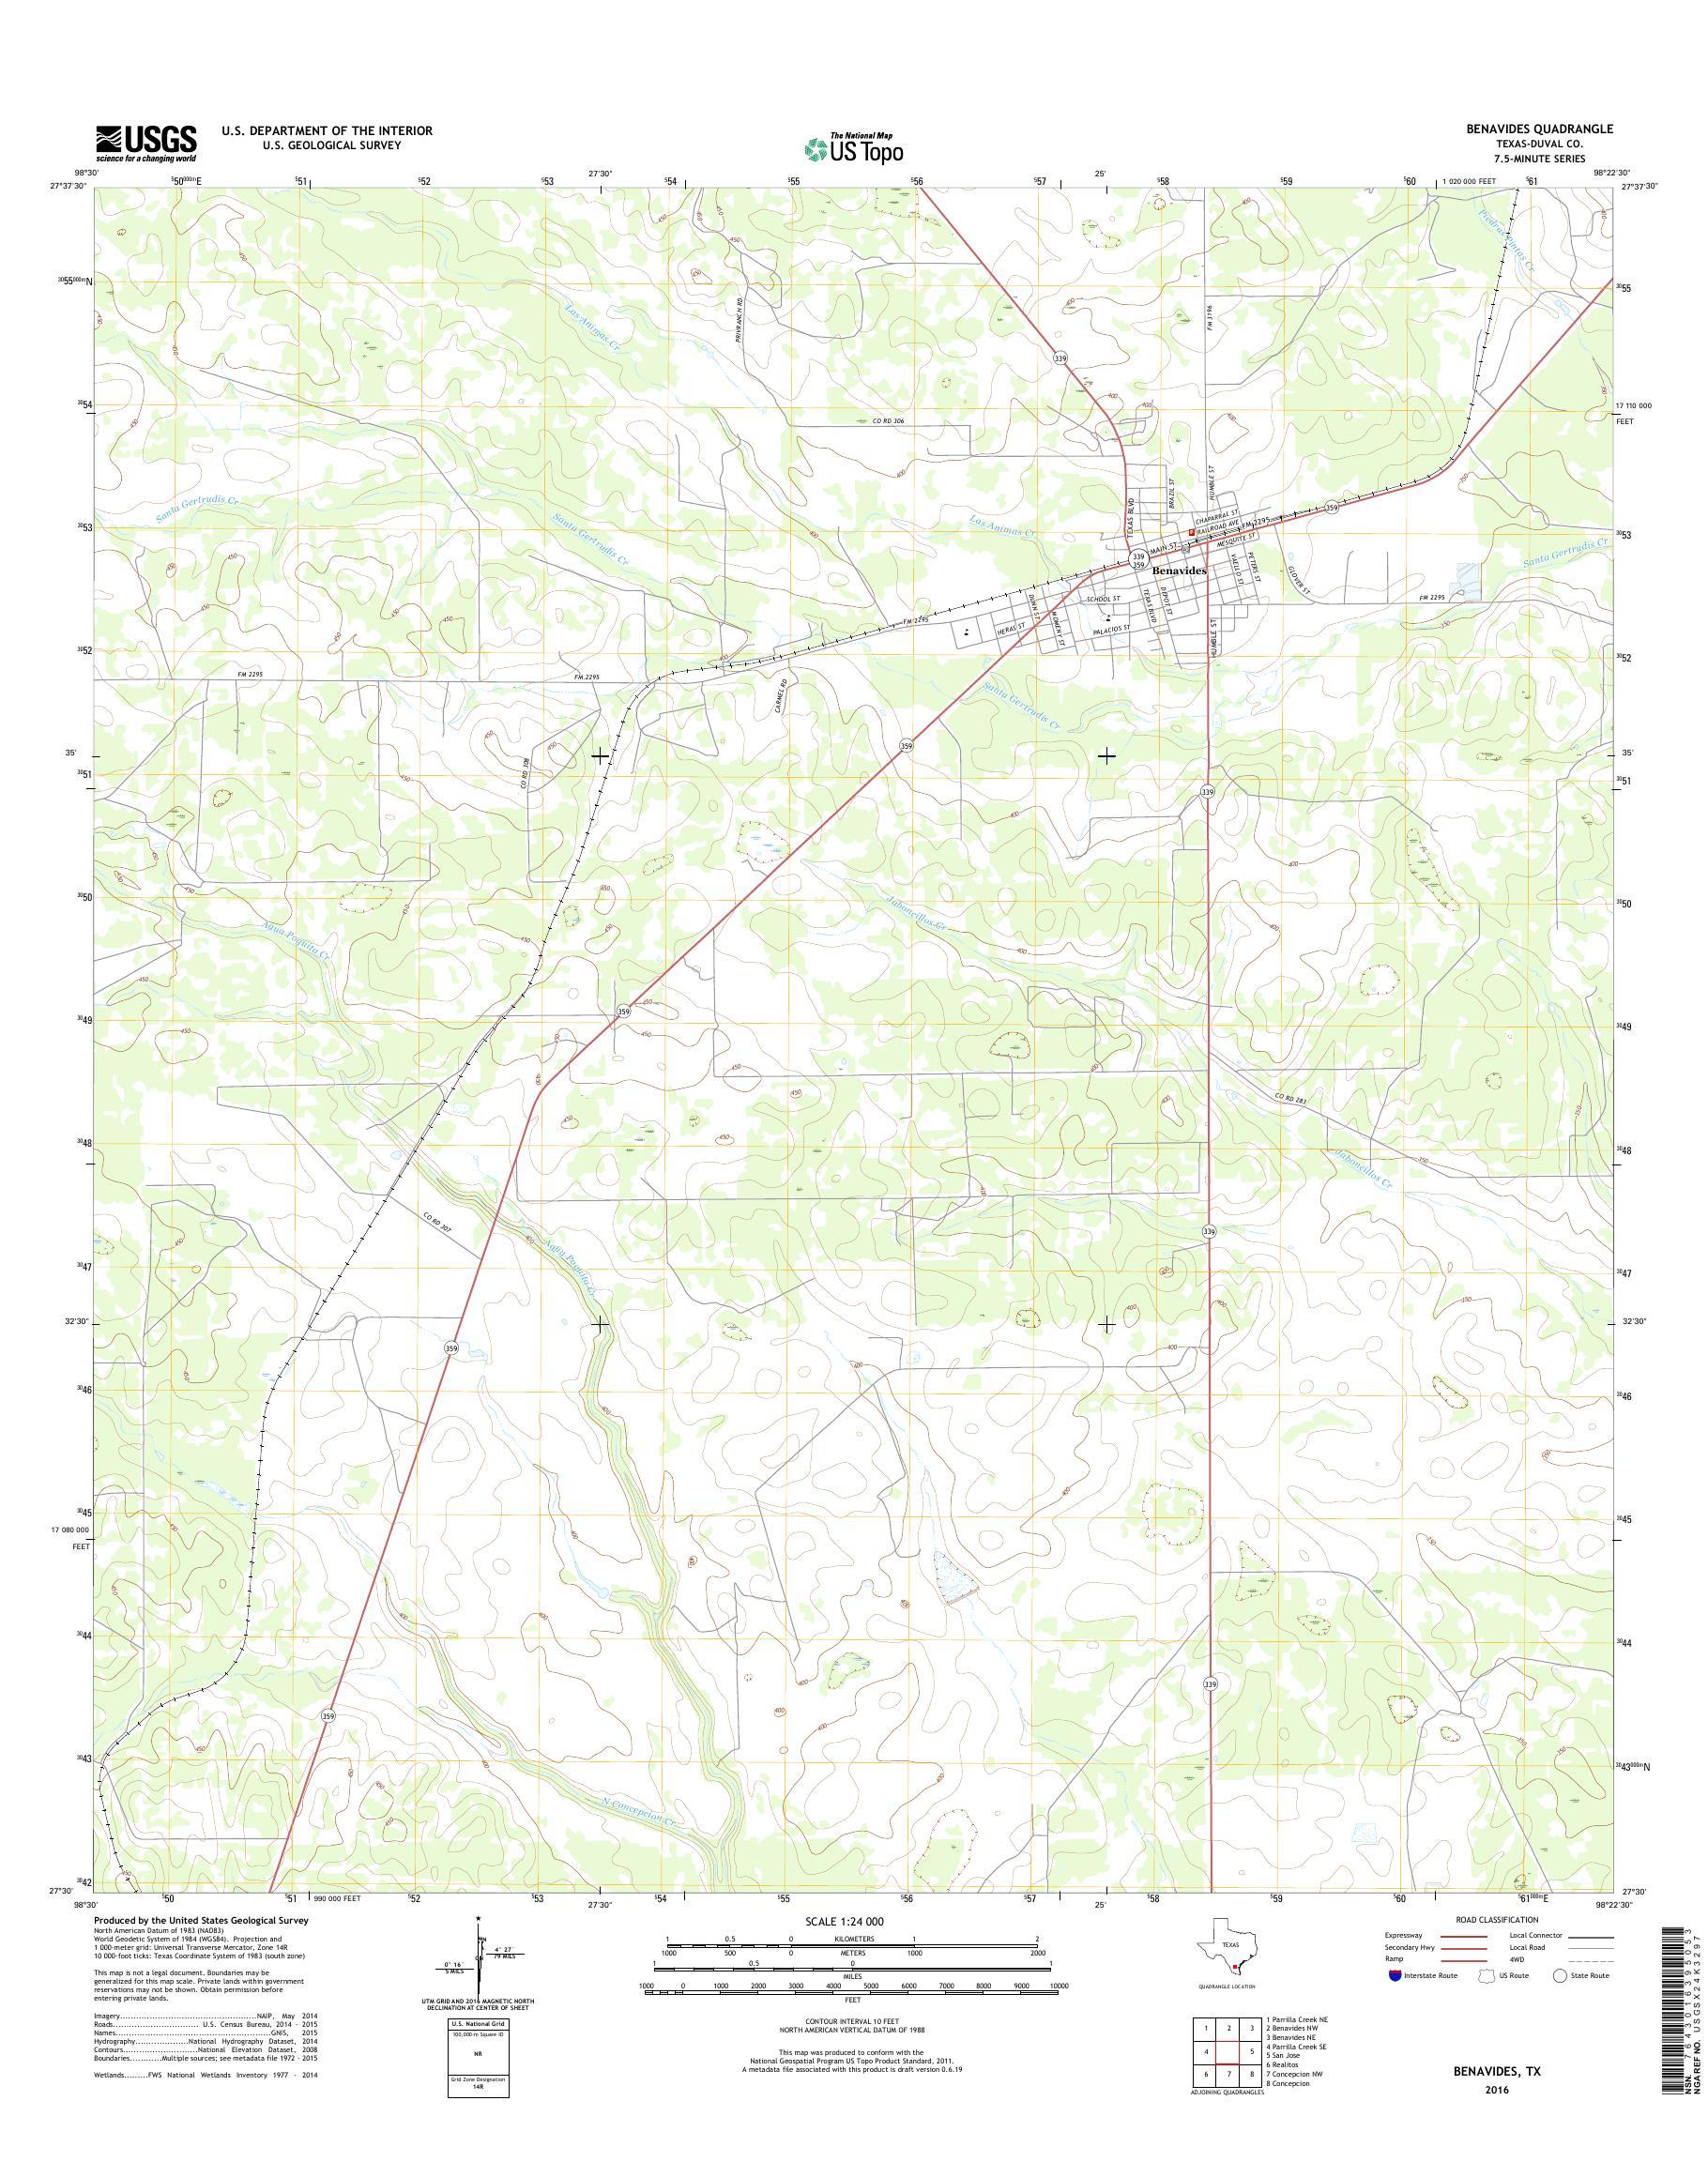 MyTopo Benavides, Texas USGS Quad Topo Map